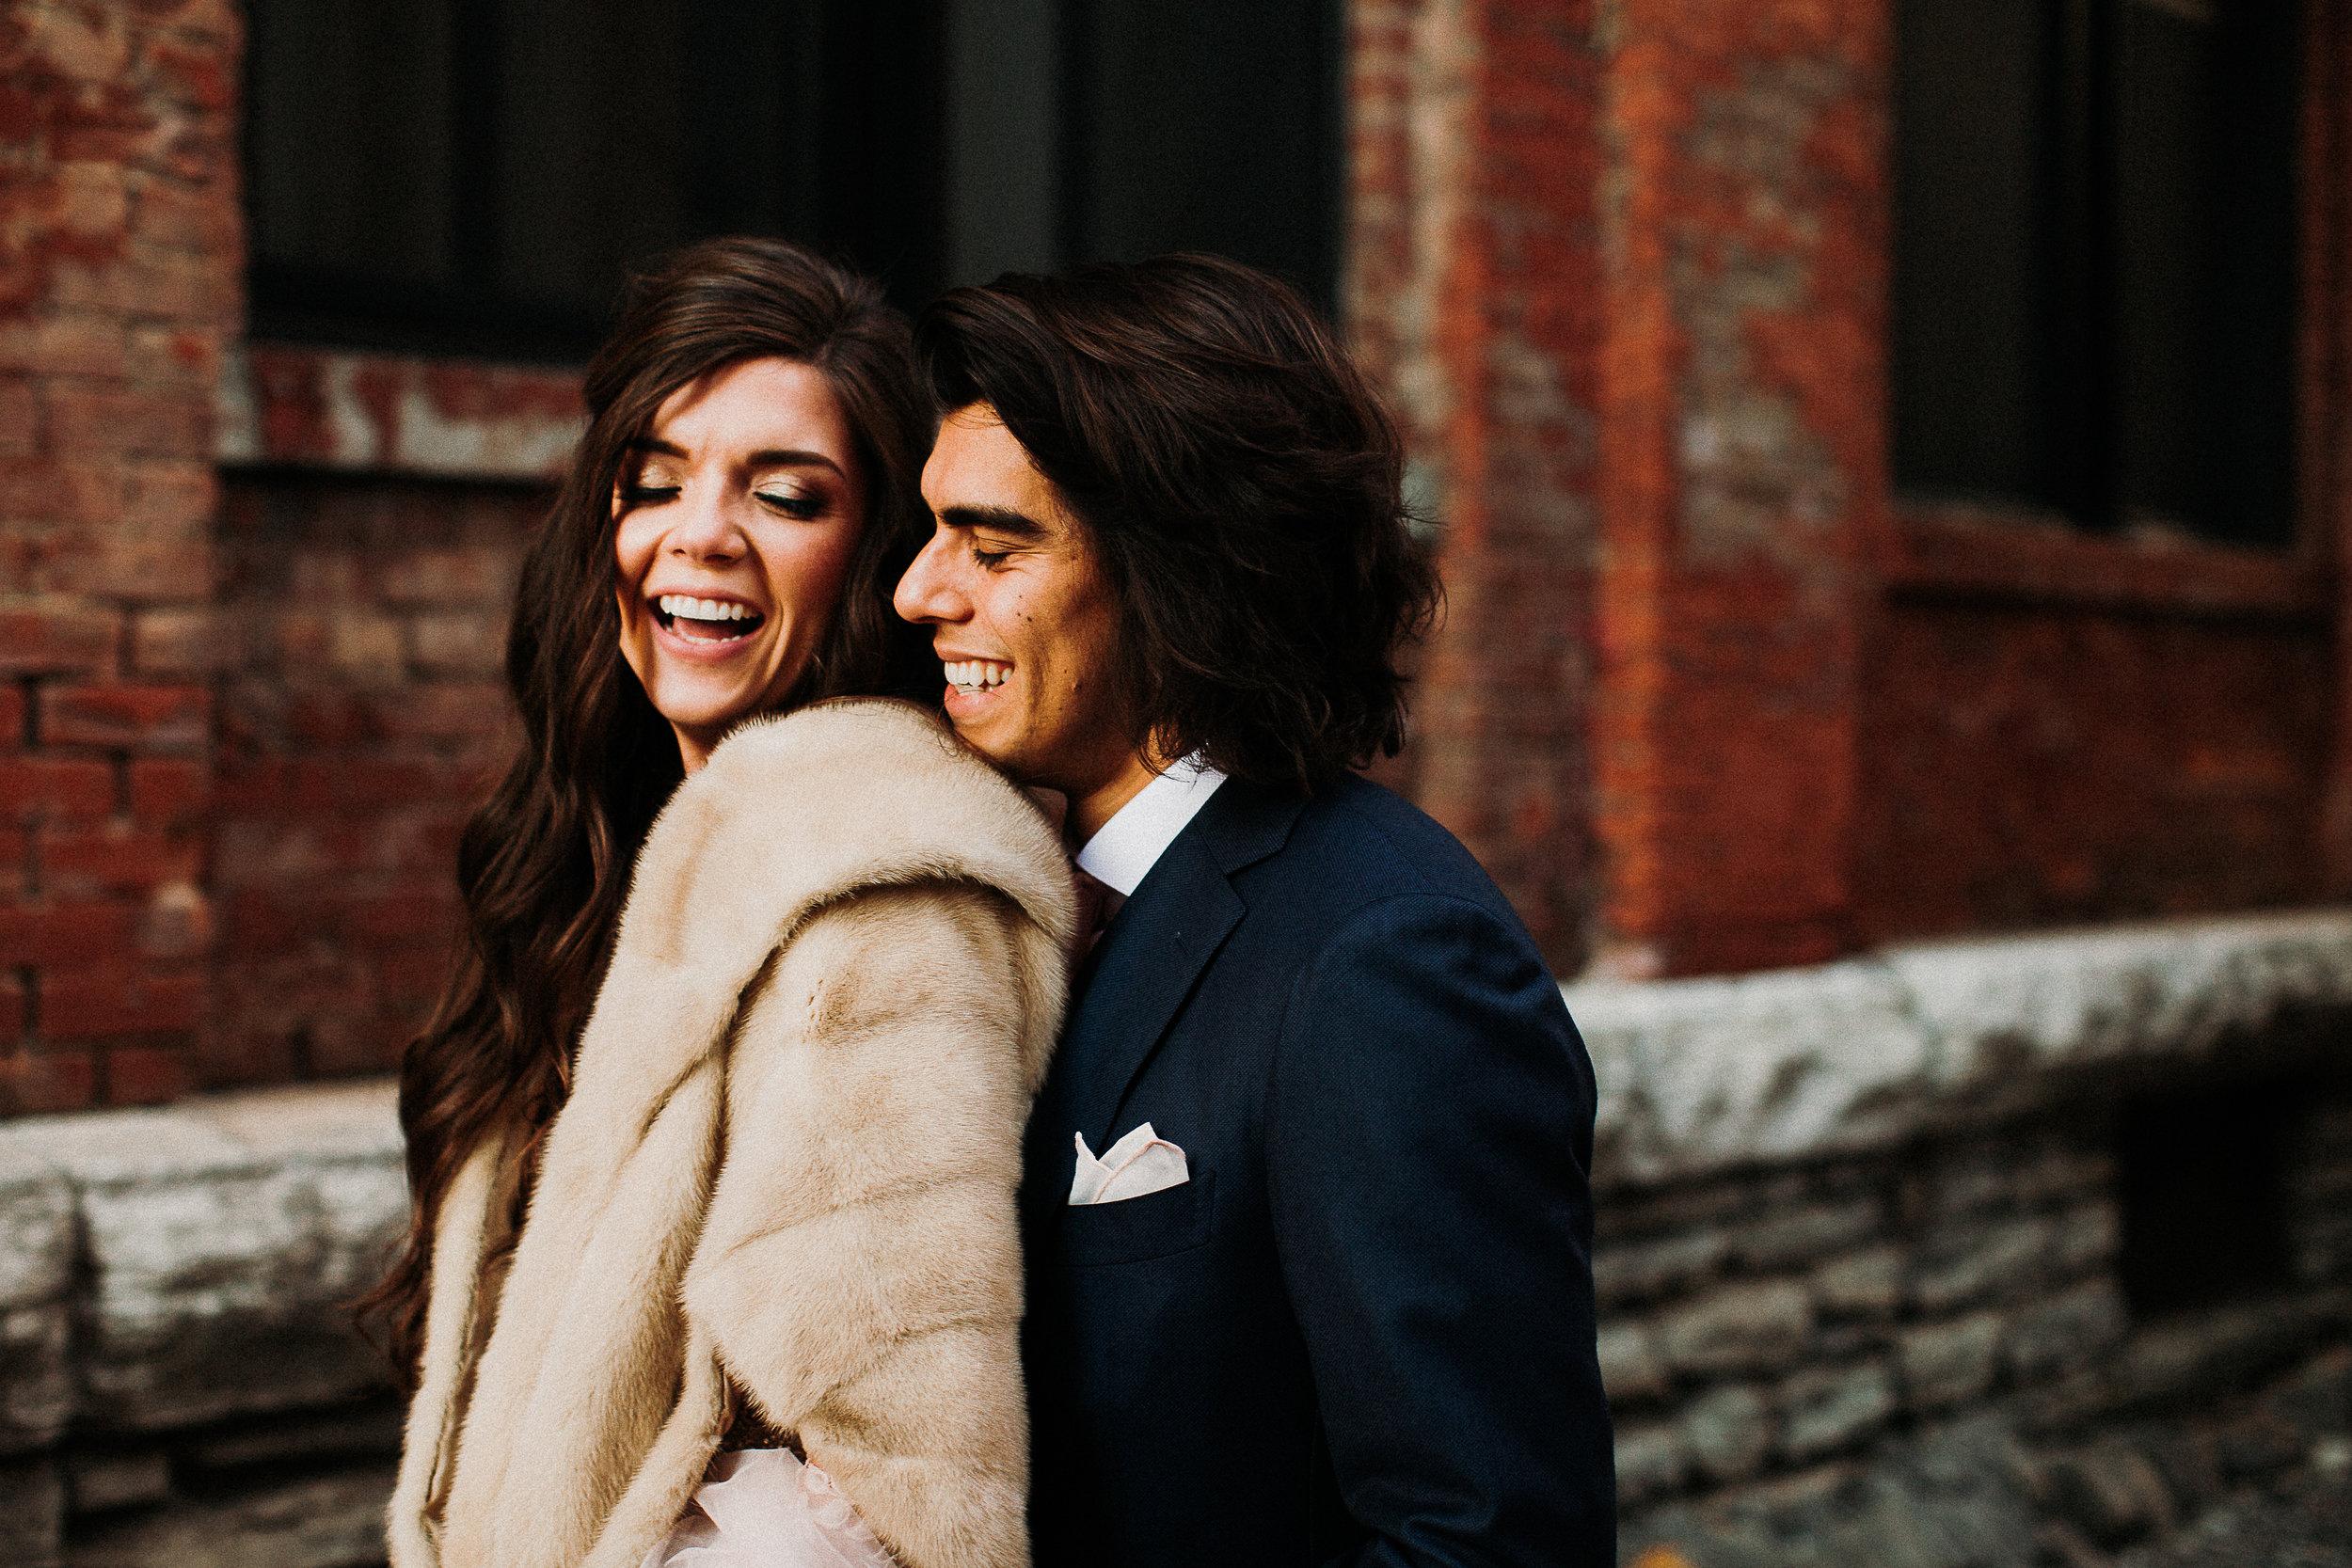 067 Stephanie and Diego - 20180310.jpg